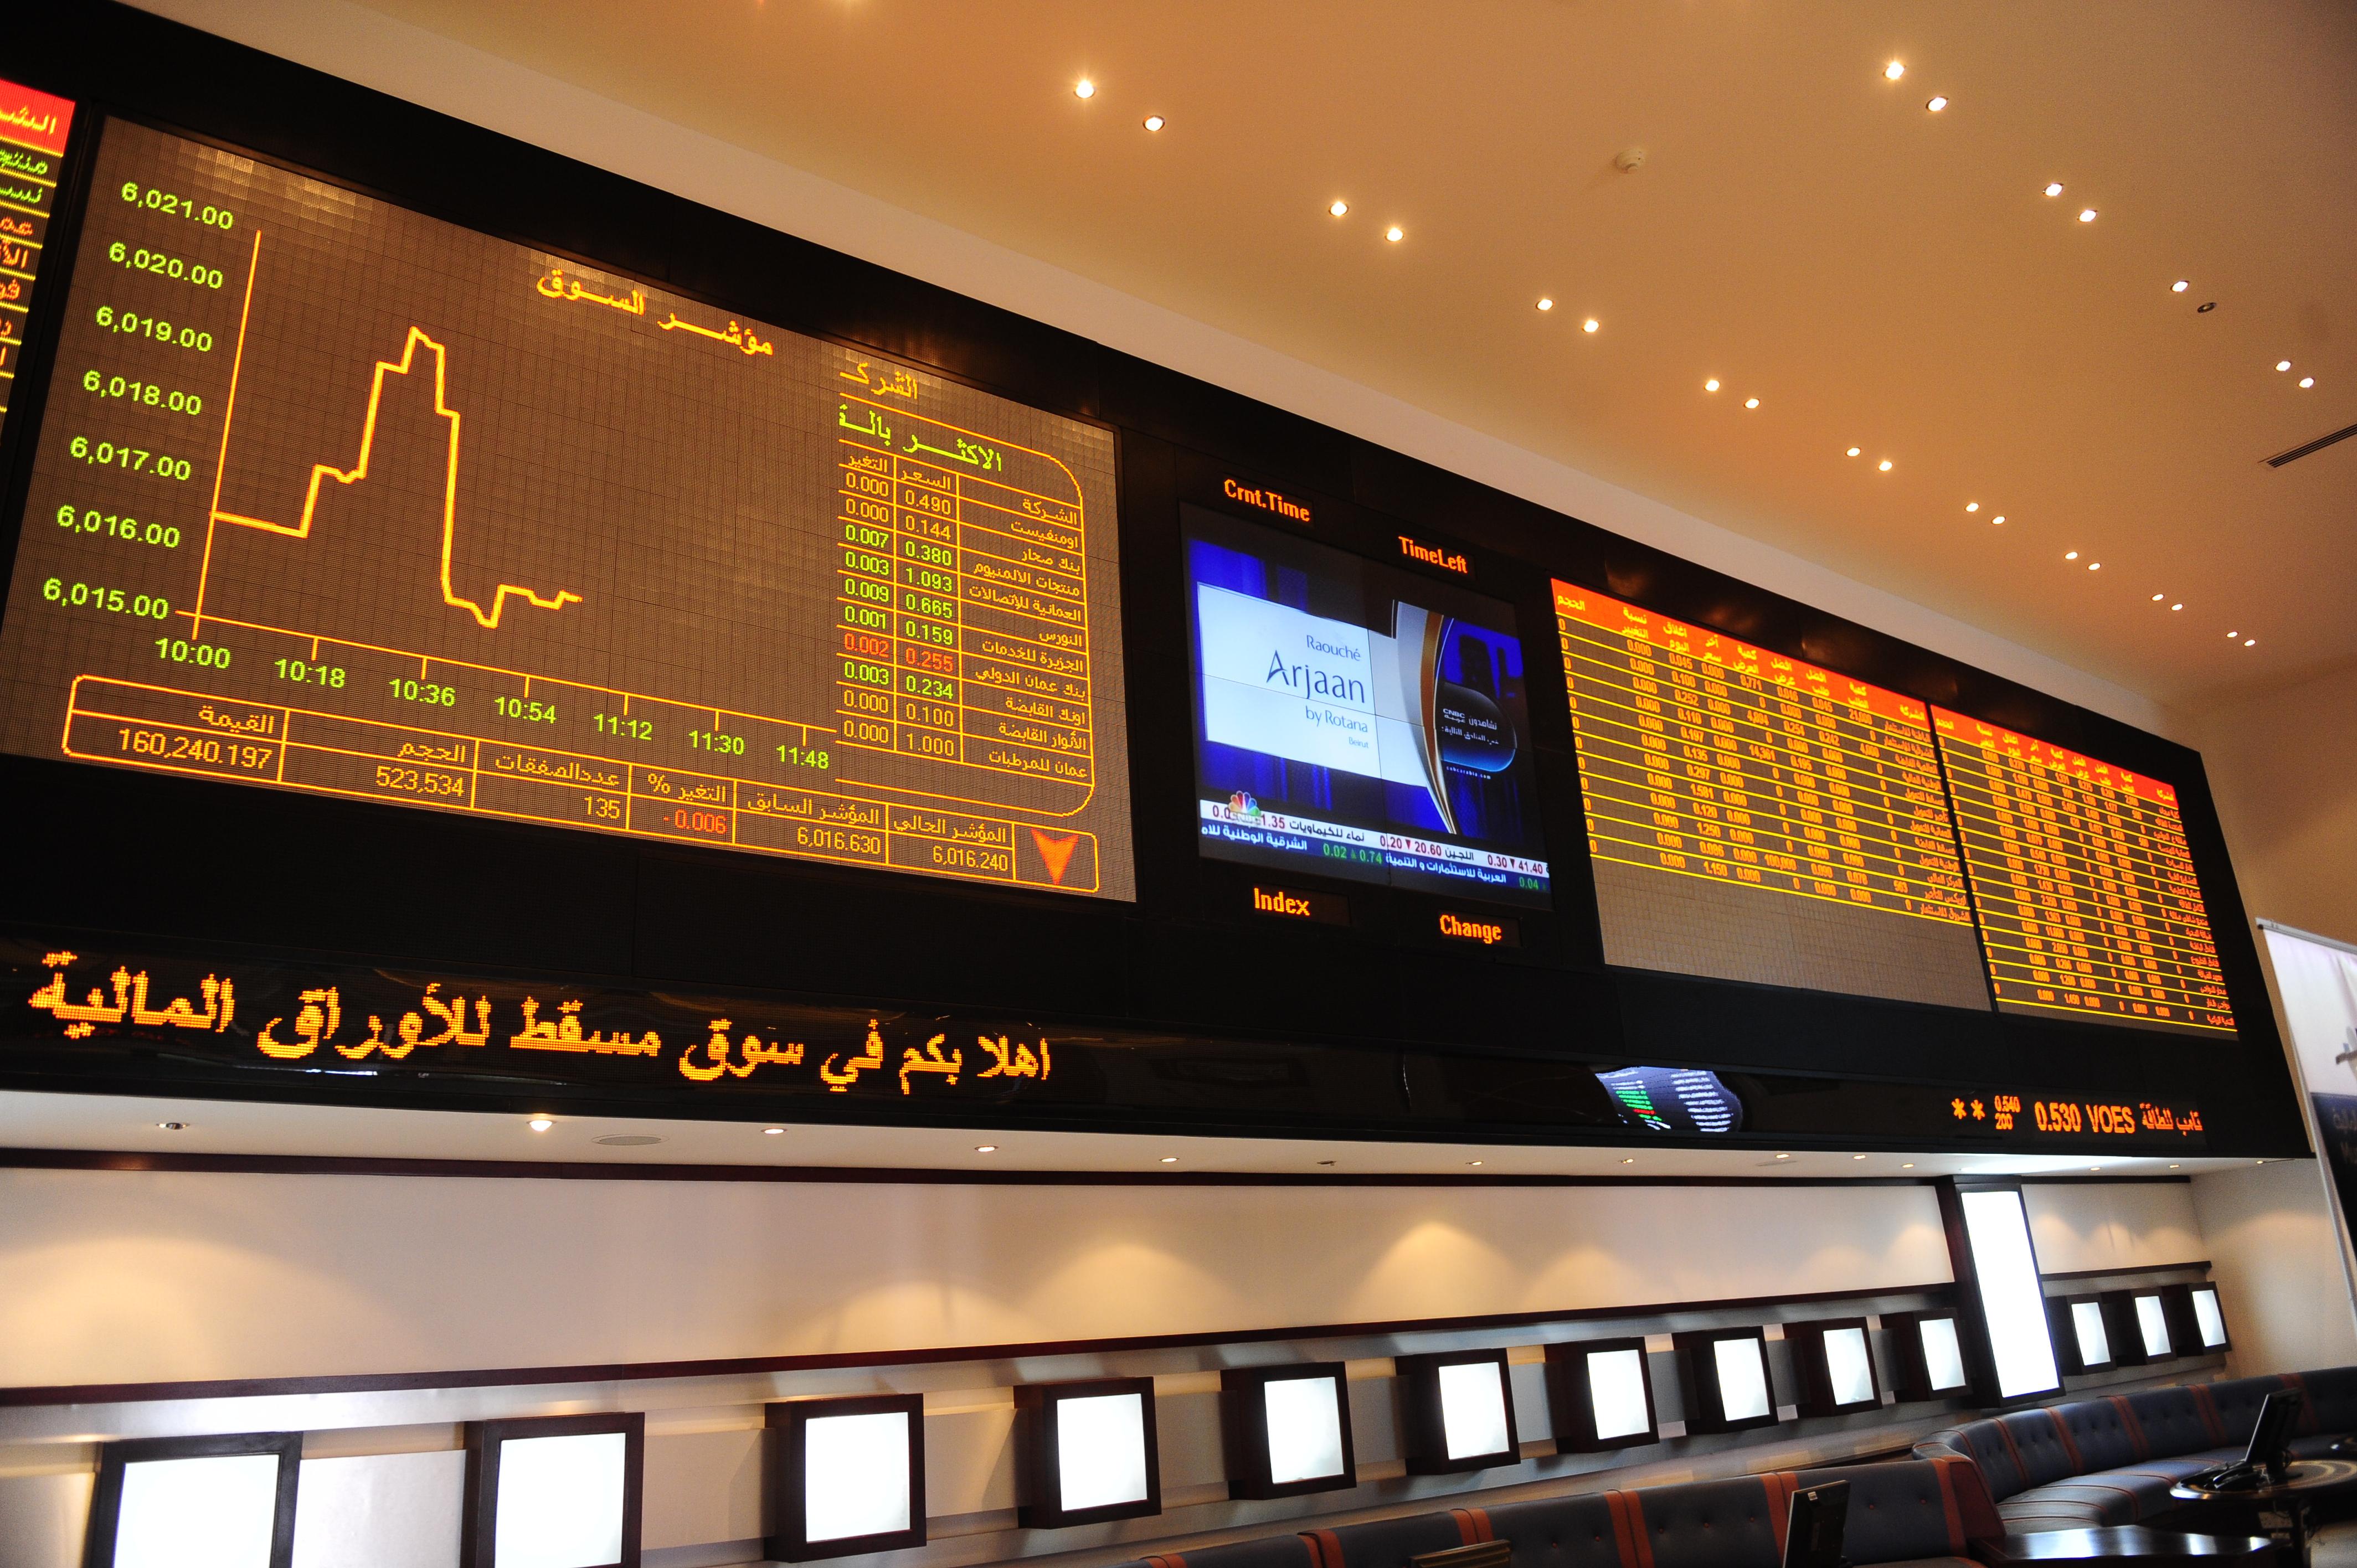 Oman share index ends lower marginally